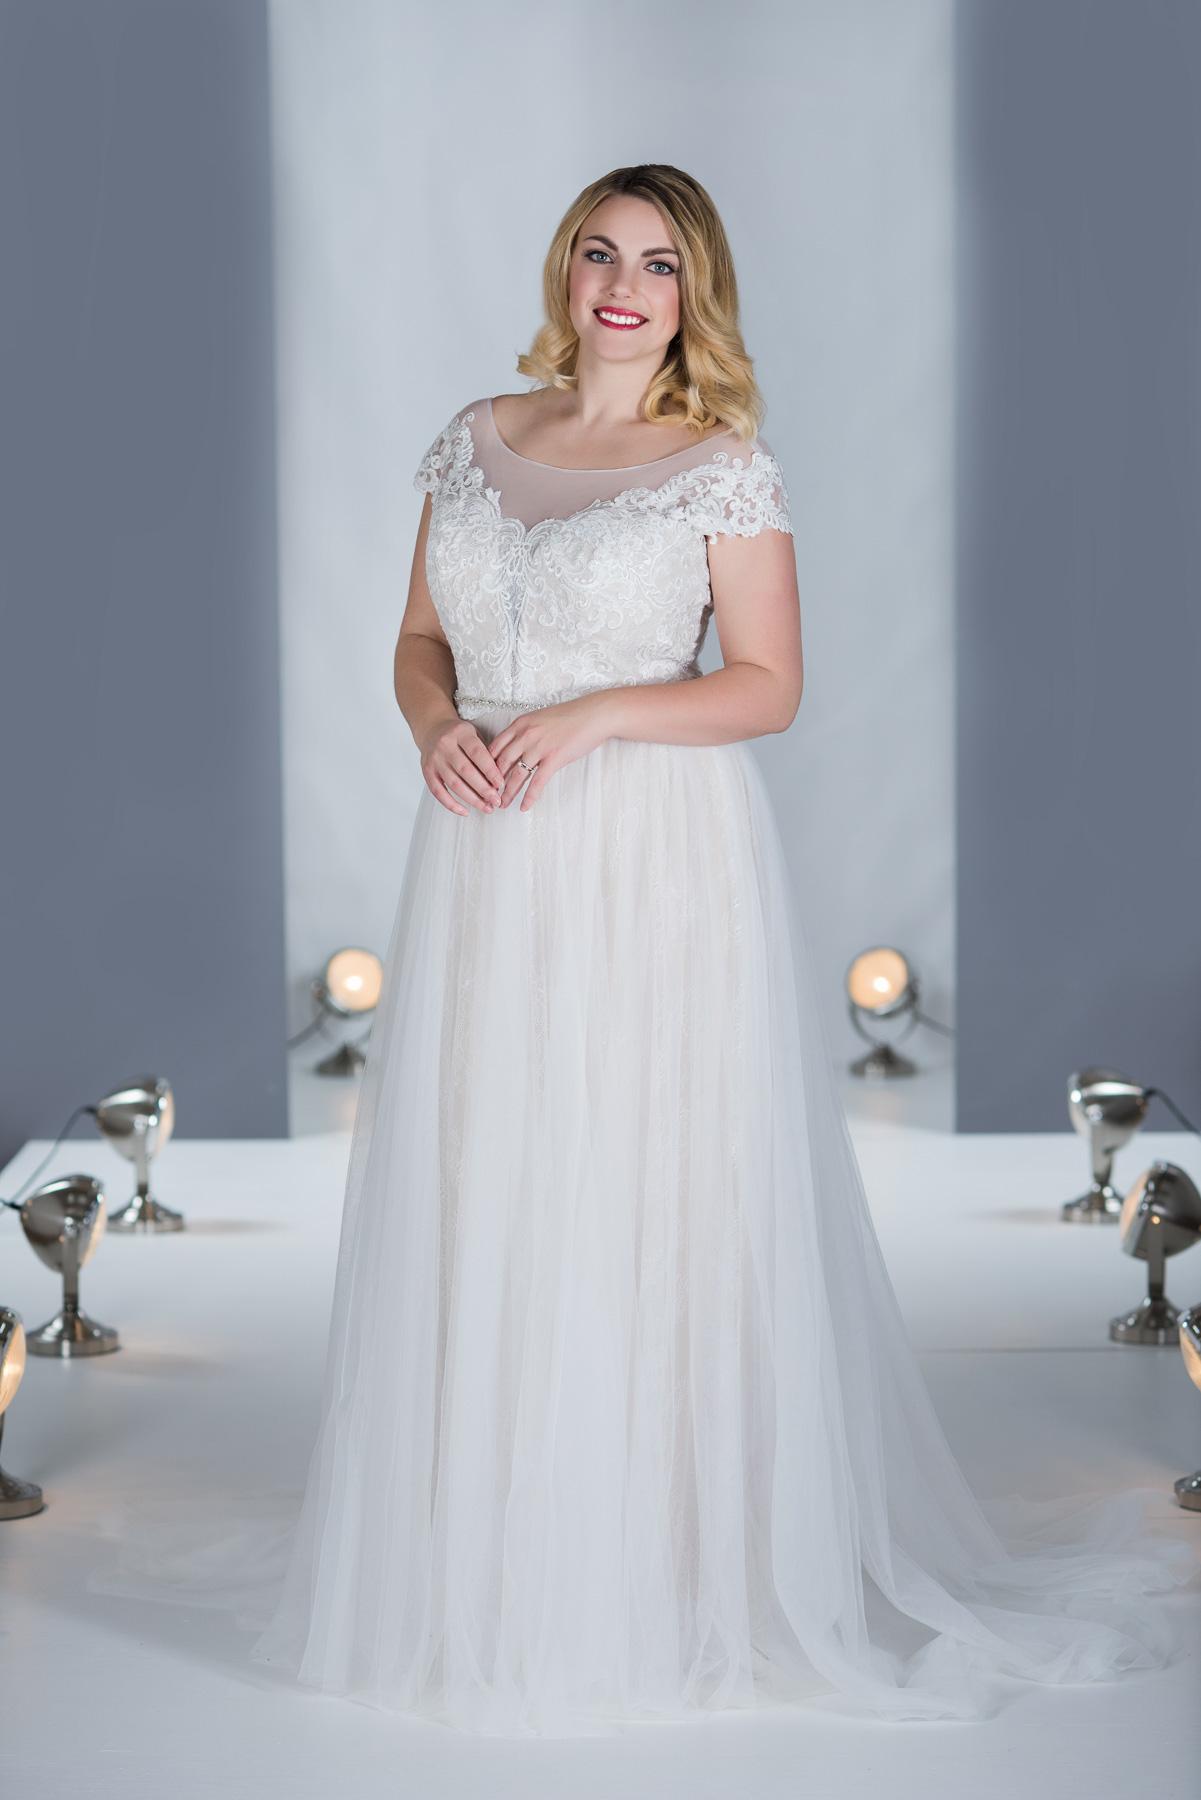 Mille Grace Bridal - MG13 - Kurvig-Gluecklich